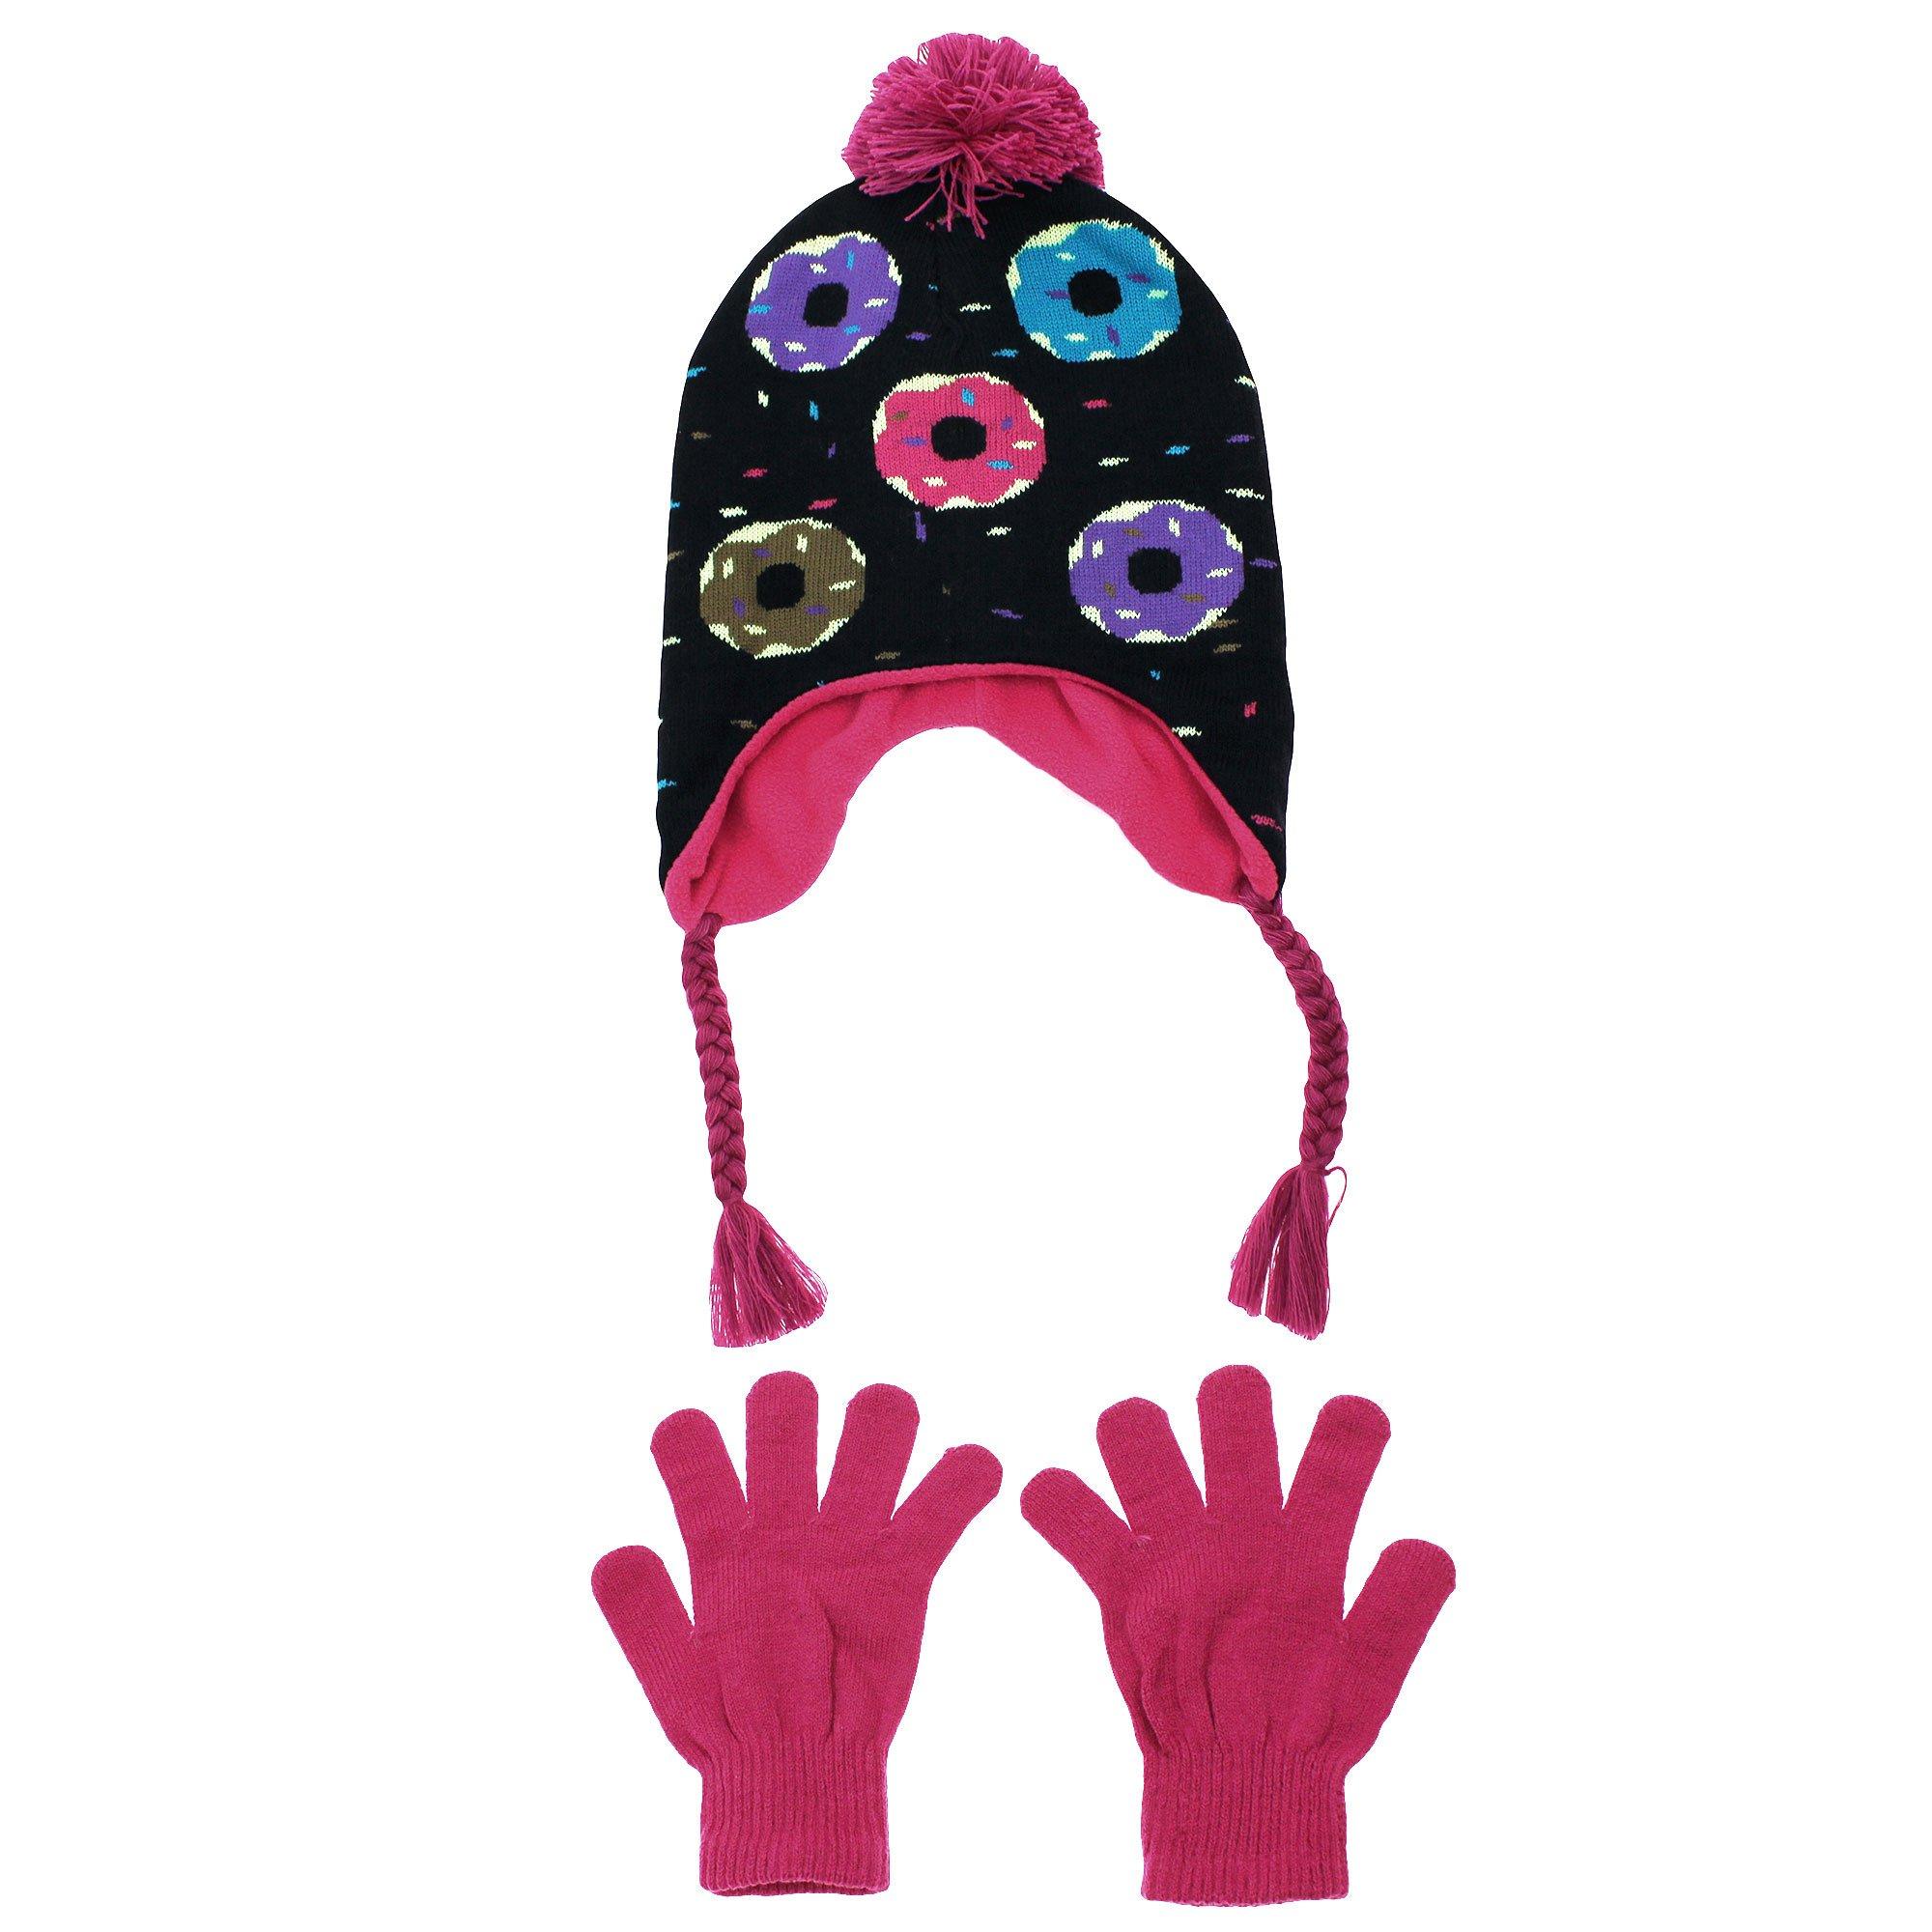 Nolan Girl Peruvian Fleece Lined Winter Hat with Doughnuts | Donut Black Pink 4-14